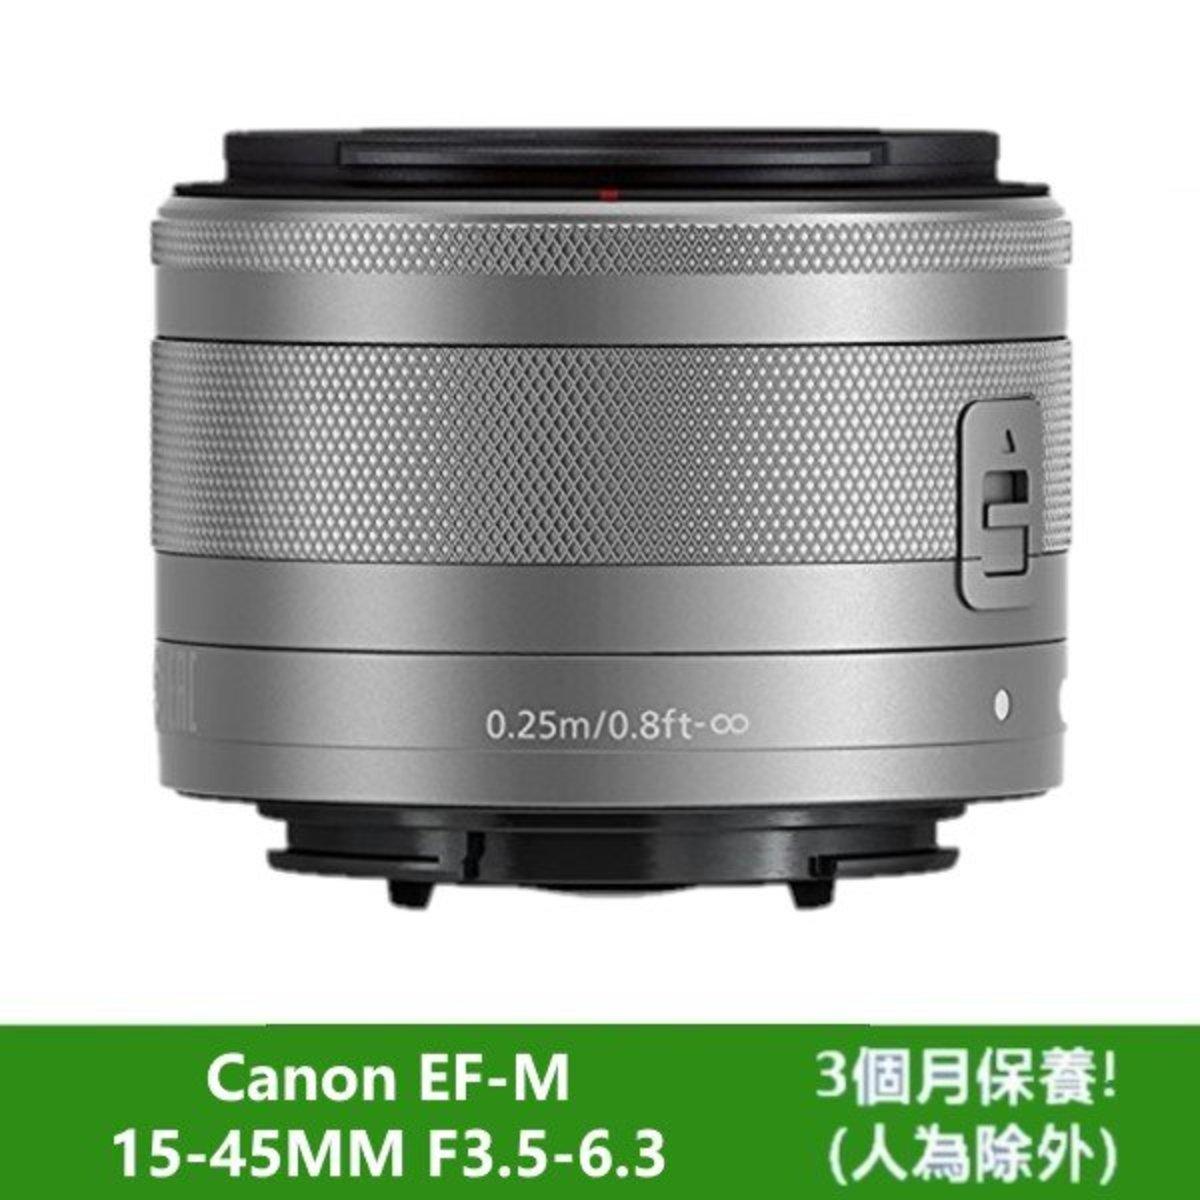 Canon EF-M15-45mm f/3.5-6.3 IS STM lens Gray (Kit Lens No Box, White Box) Parallel Import